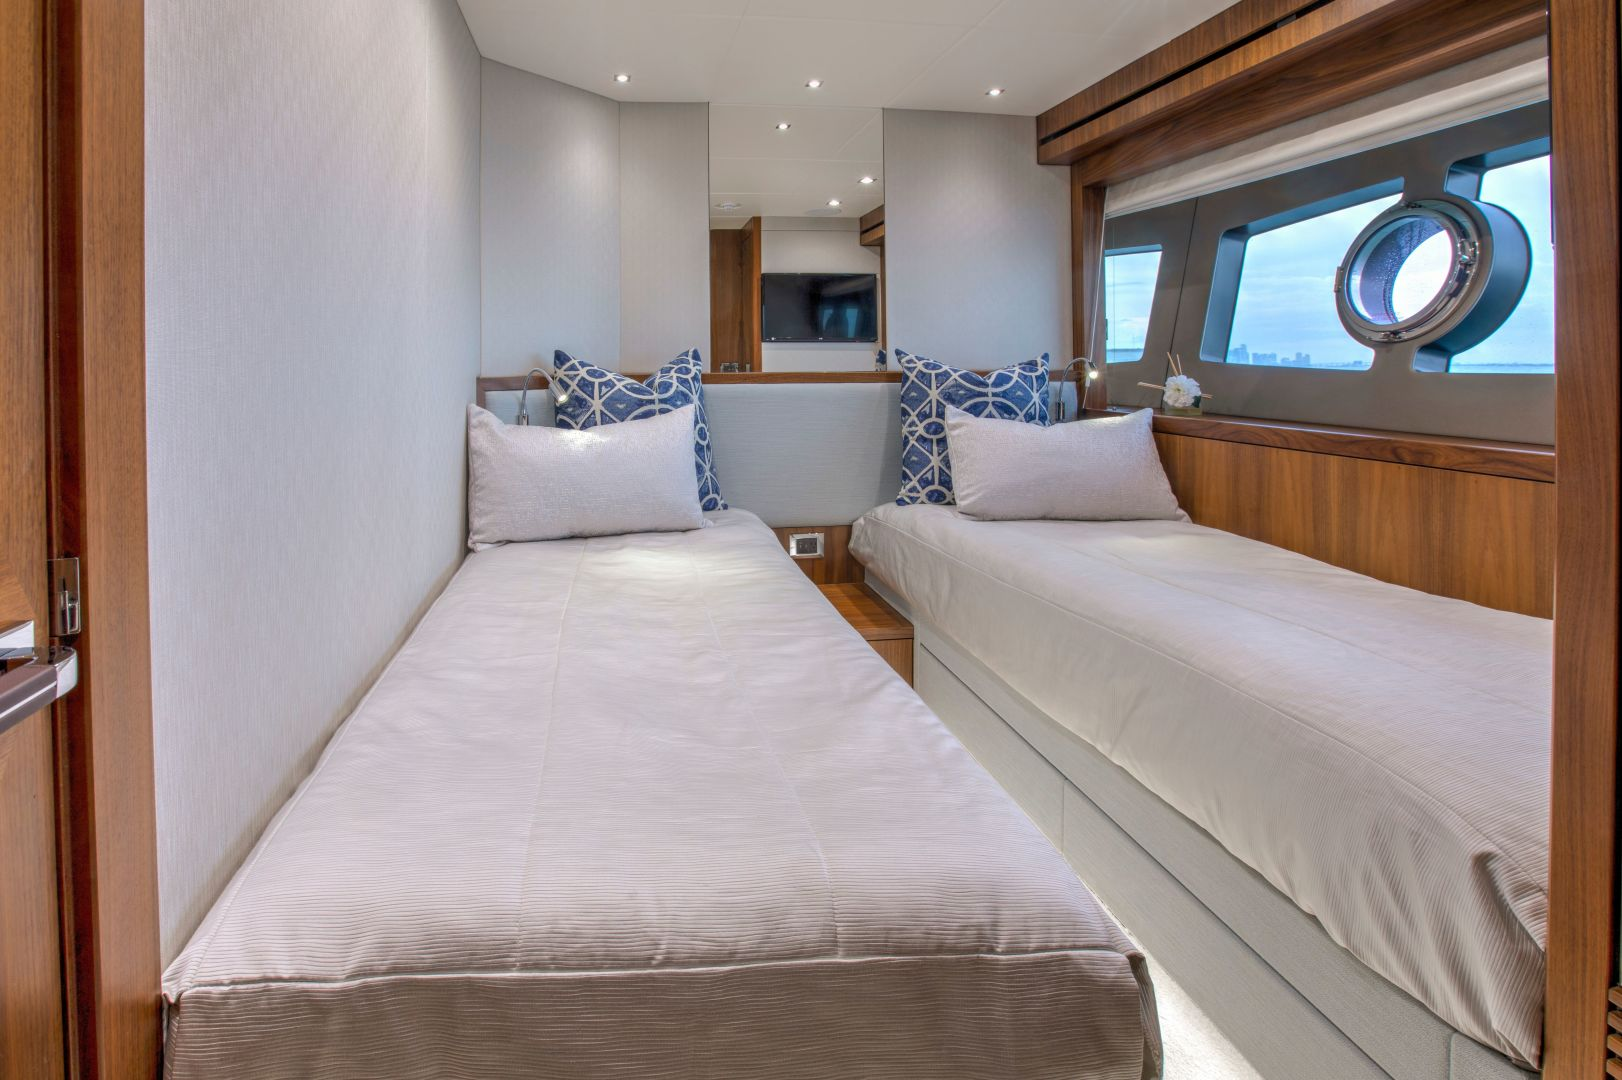 Sunseeker-95 Yacht 2017-Perseverance 3 Ft Lauderdale-Florida-United States-1400110   Thumbnail